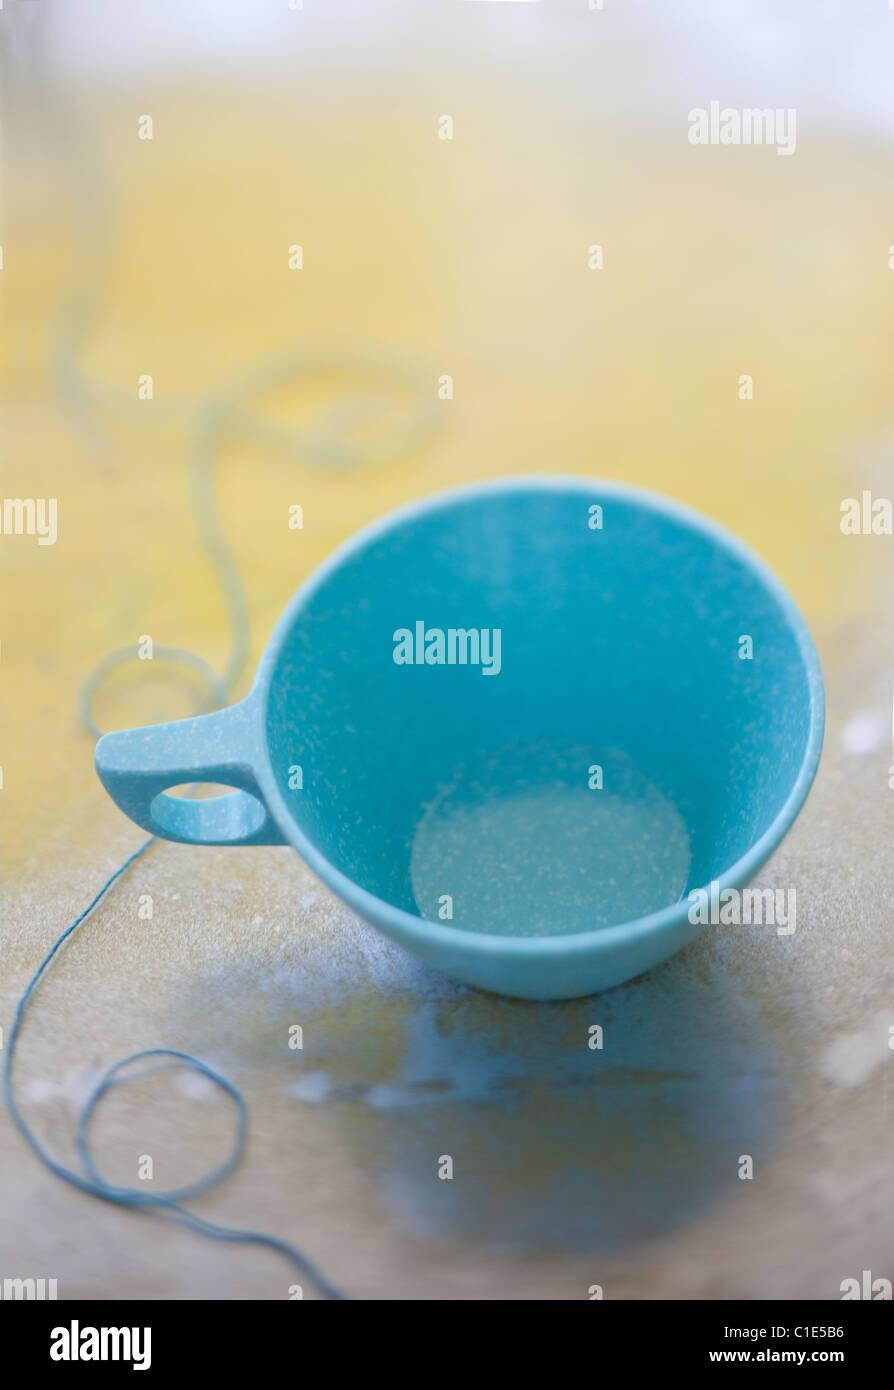 Luce blu tazza da caffè con stringa Immagini Stock